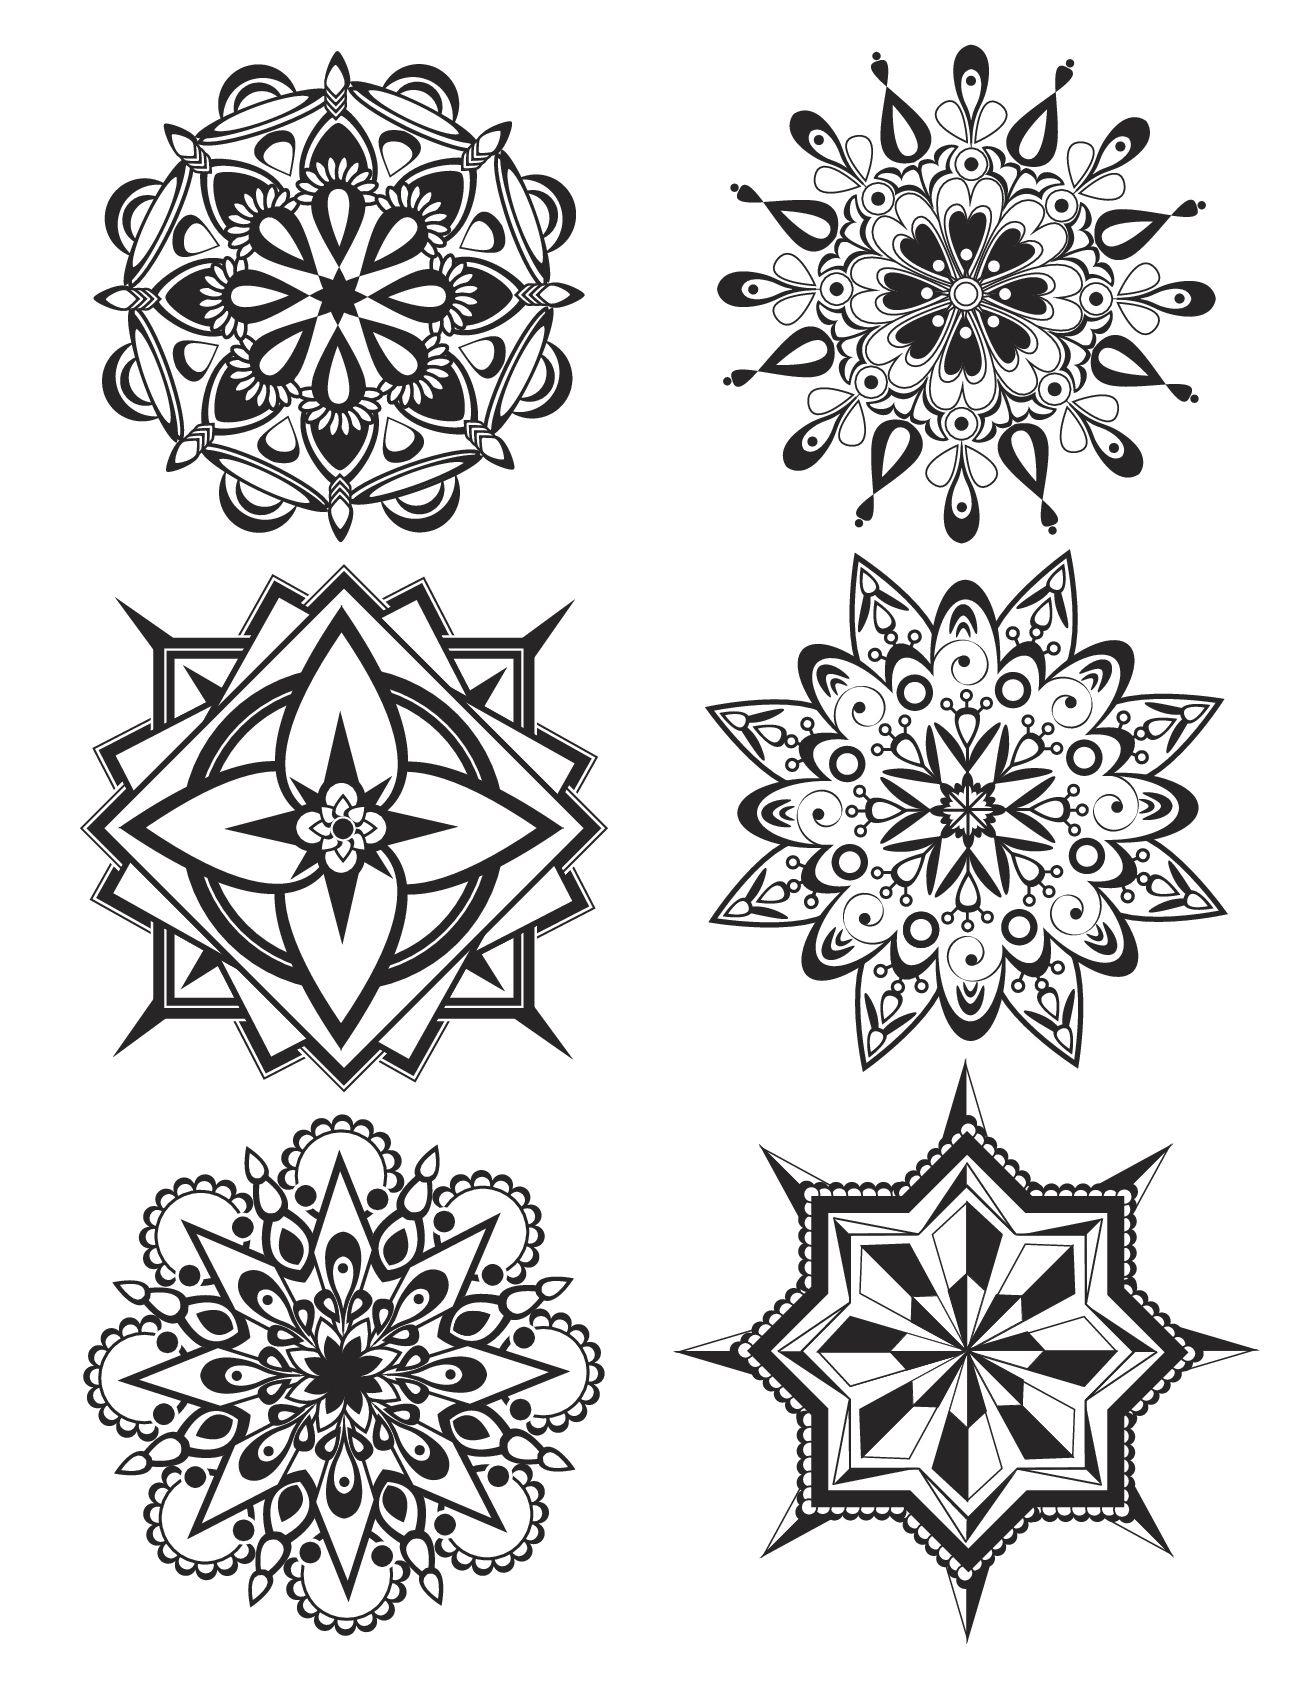 Raskraski Mandala 6 Mini Mandal Coloring Mandaly Raskraski Mandala I Raskraski